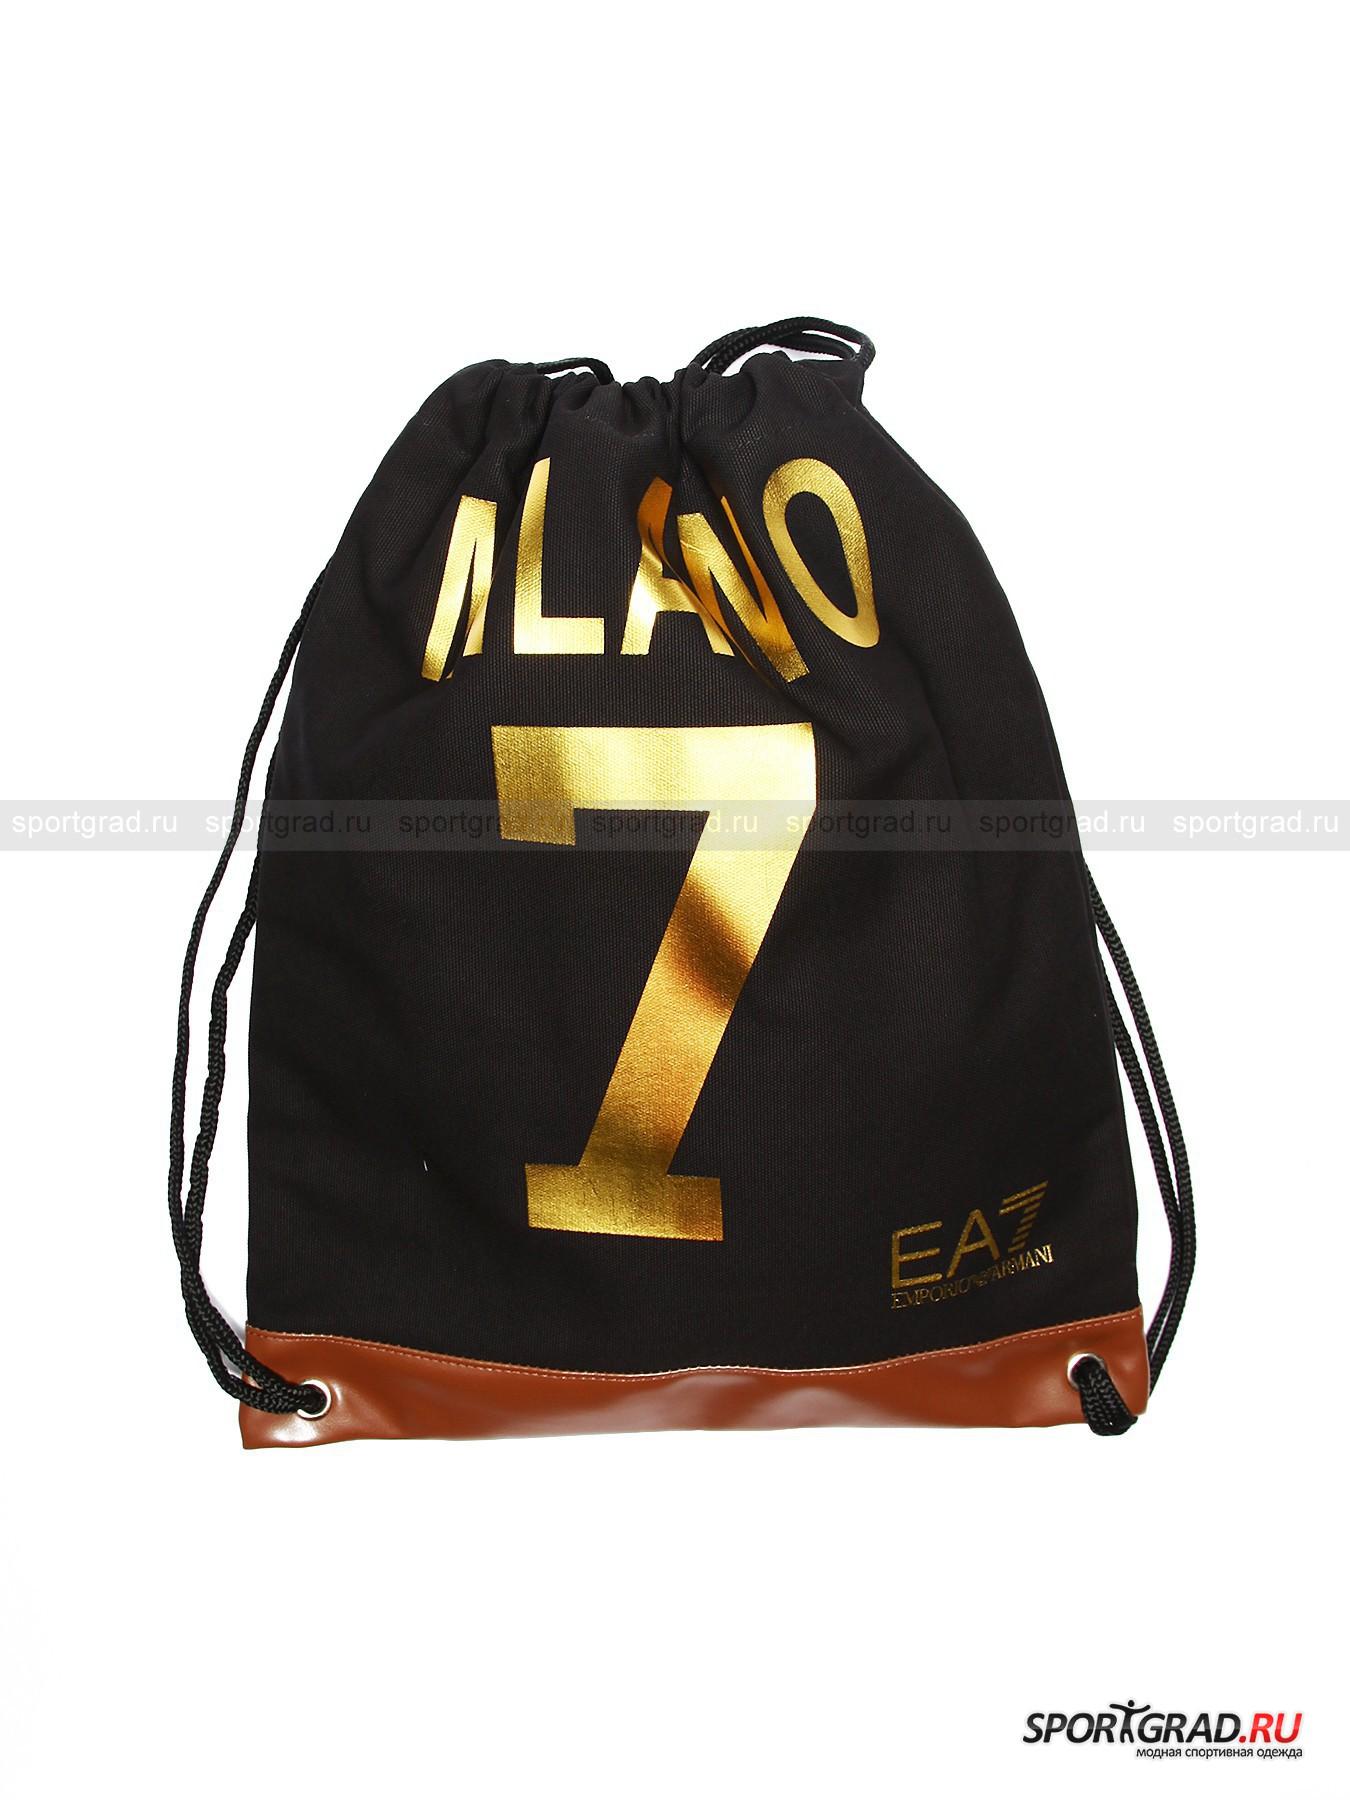 Сумка-рюкзак Milan Varsity Backpack EA7 Emporio Armani от Спортград